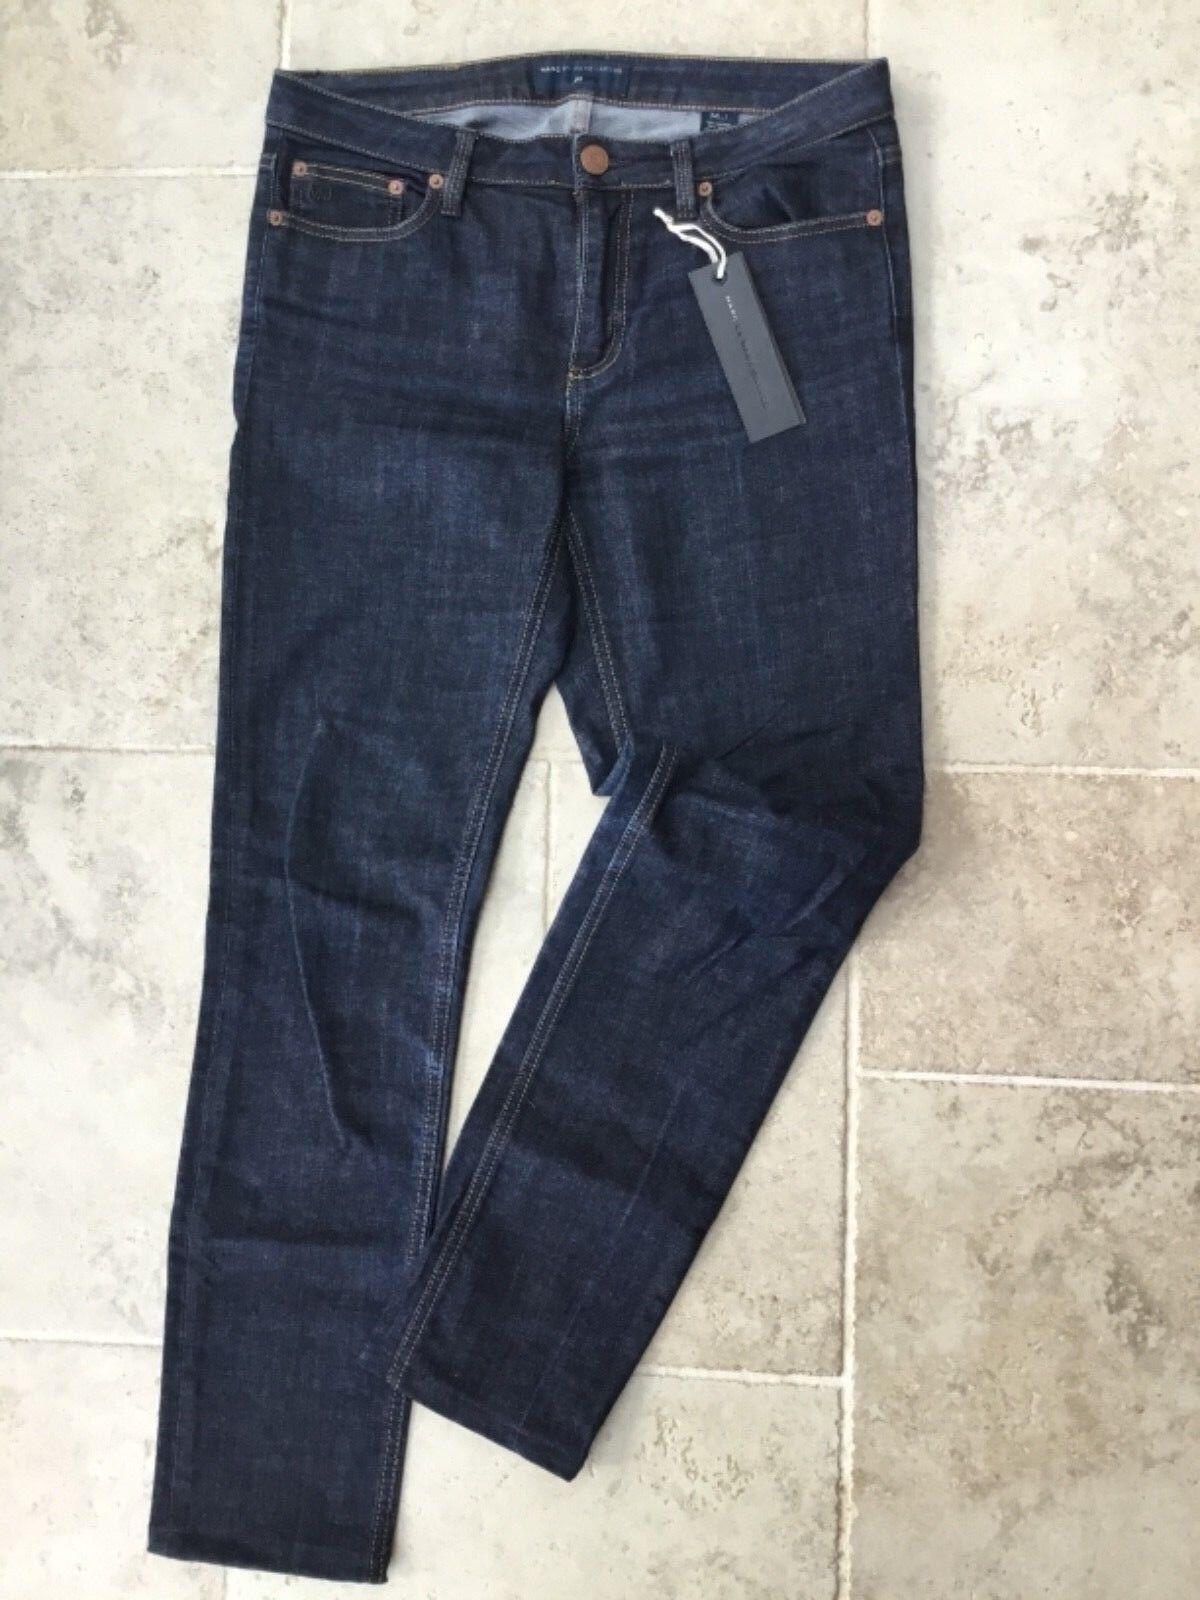 Marc by Marc Jacobs Christie Skinny  bluee Denim Jeans Size 30 RRP